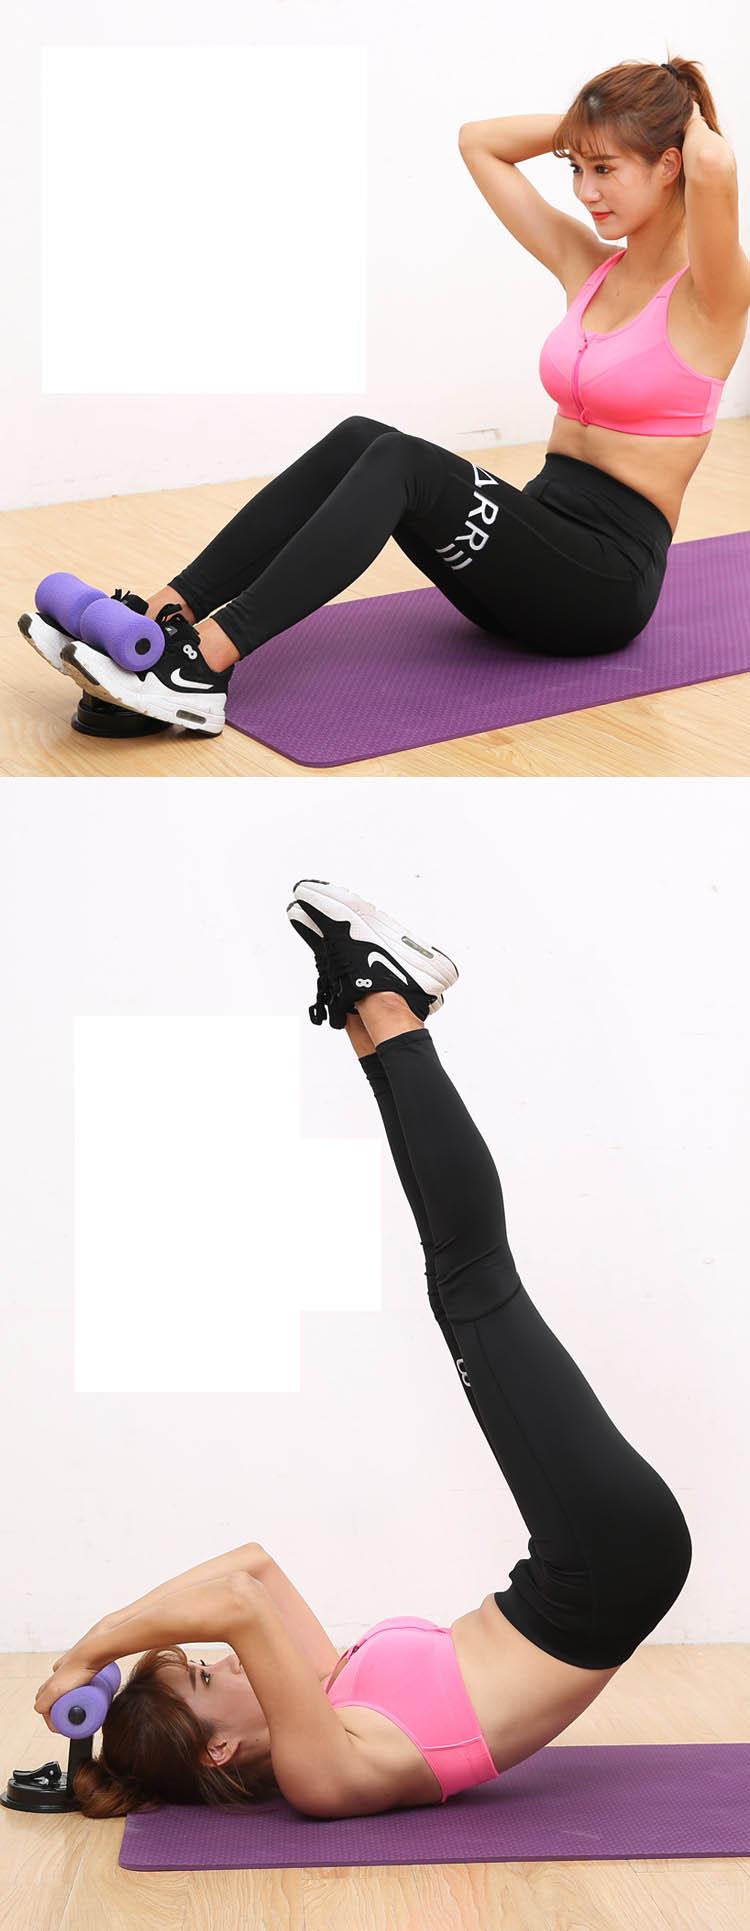 KALOAD Sit-ups Assistive Fitness Equipment Legs Waist Abdomen Beauty Sports Exercise Tools